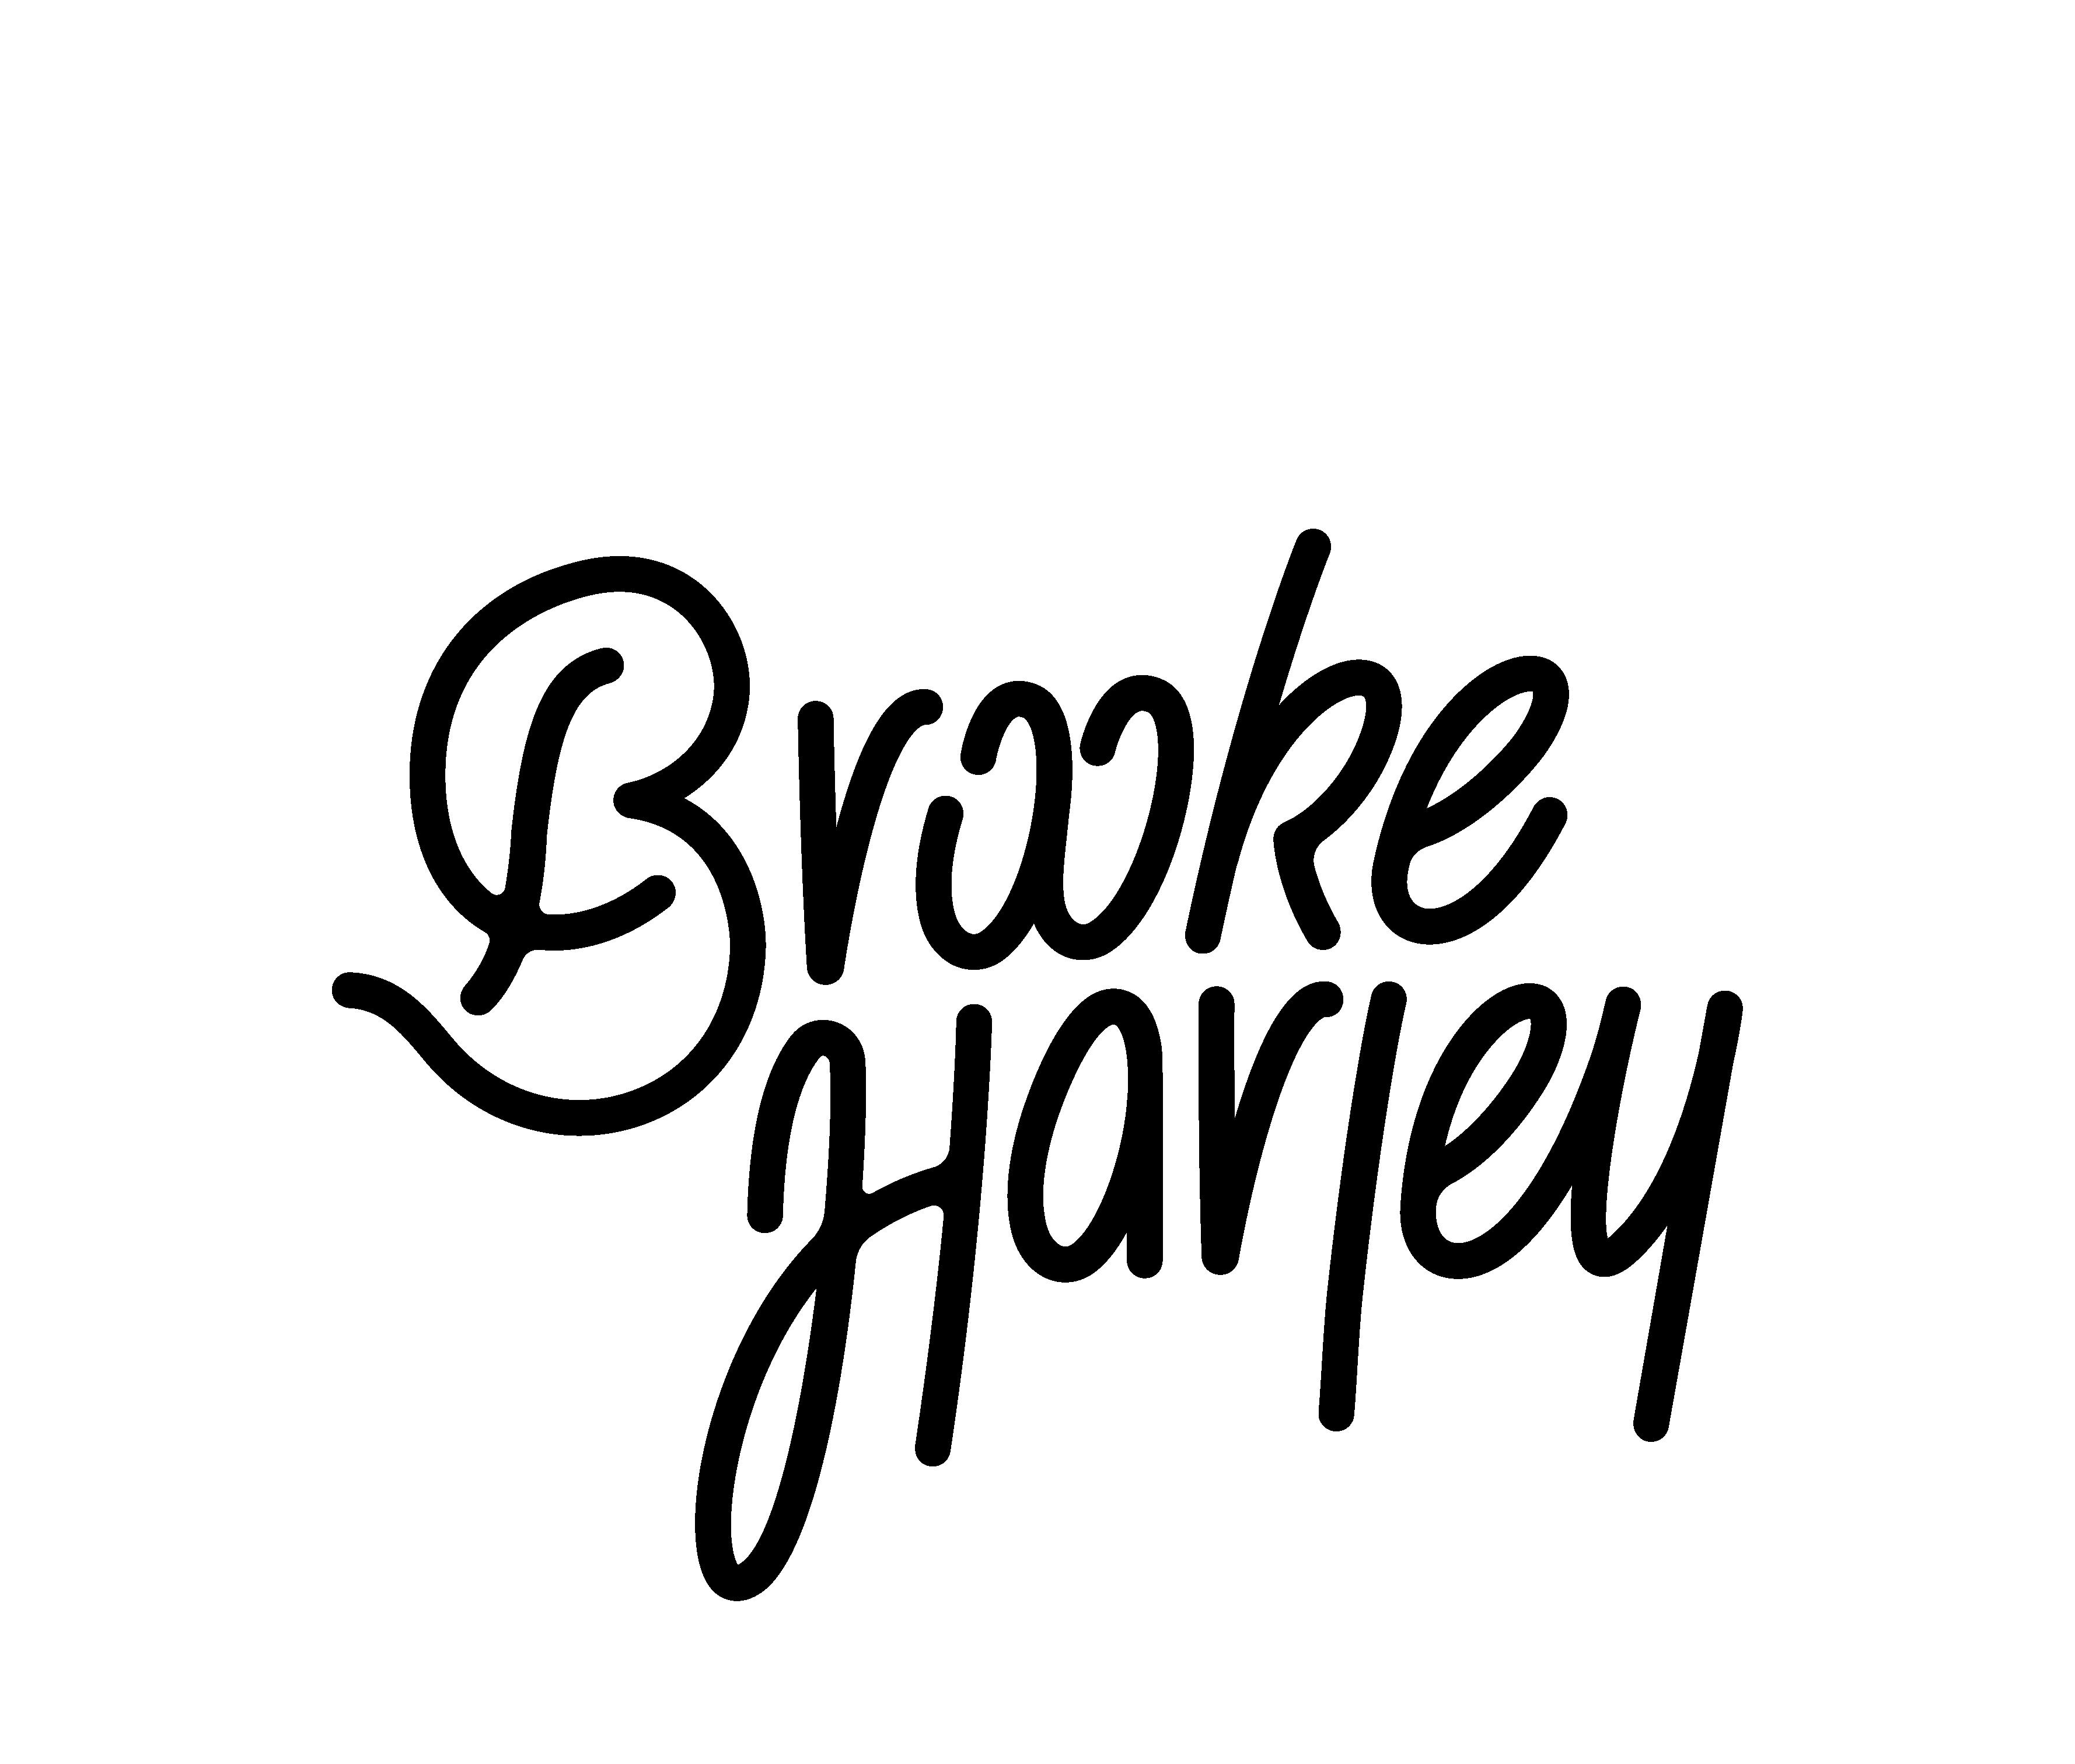 brooke harley